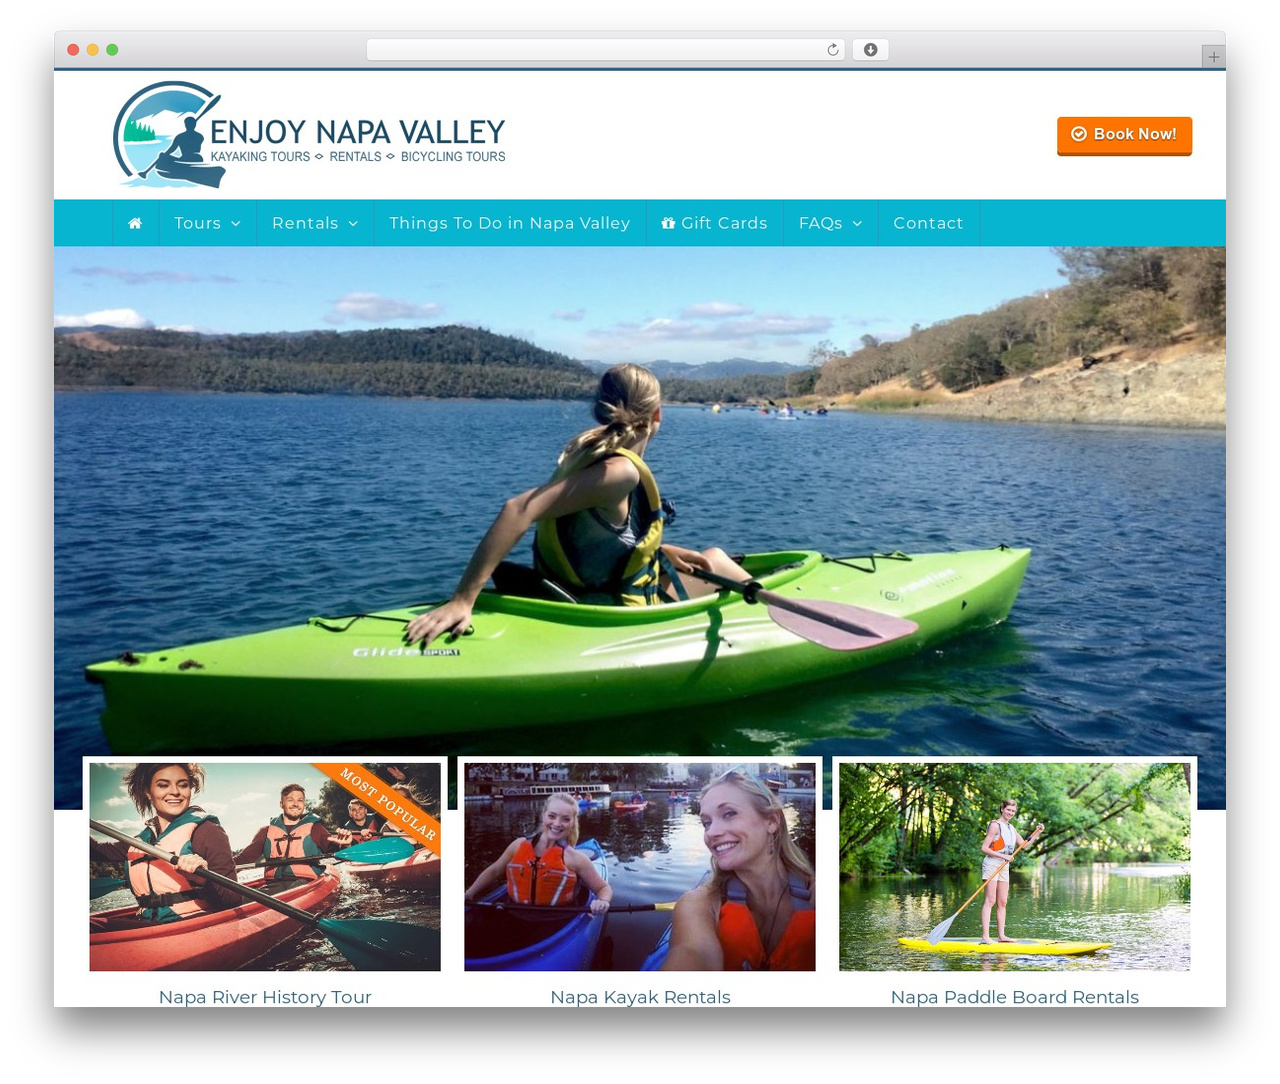 Total WordPress website template - enjoy-napa-valley.com